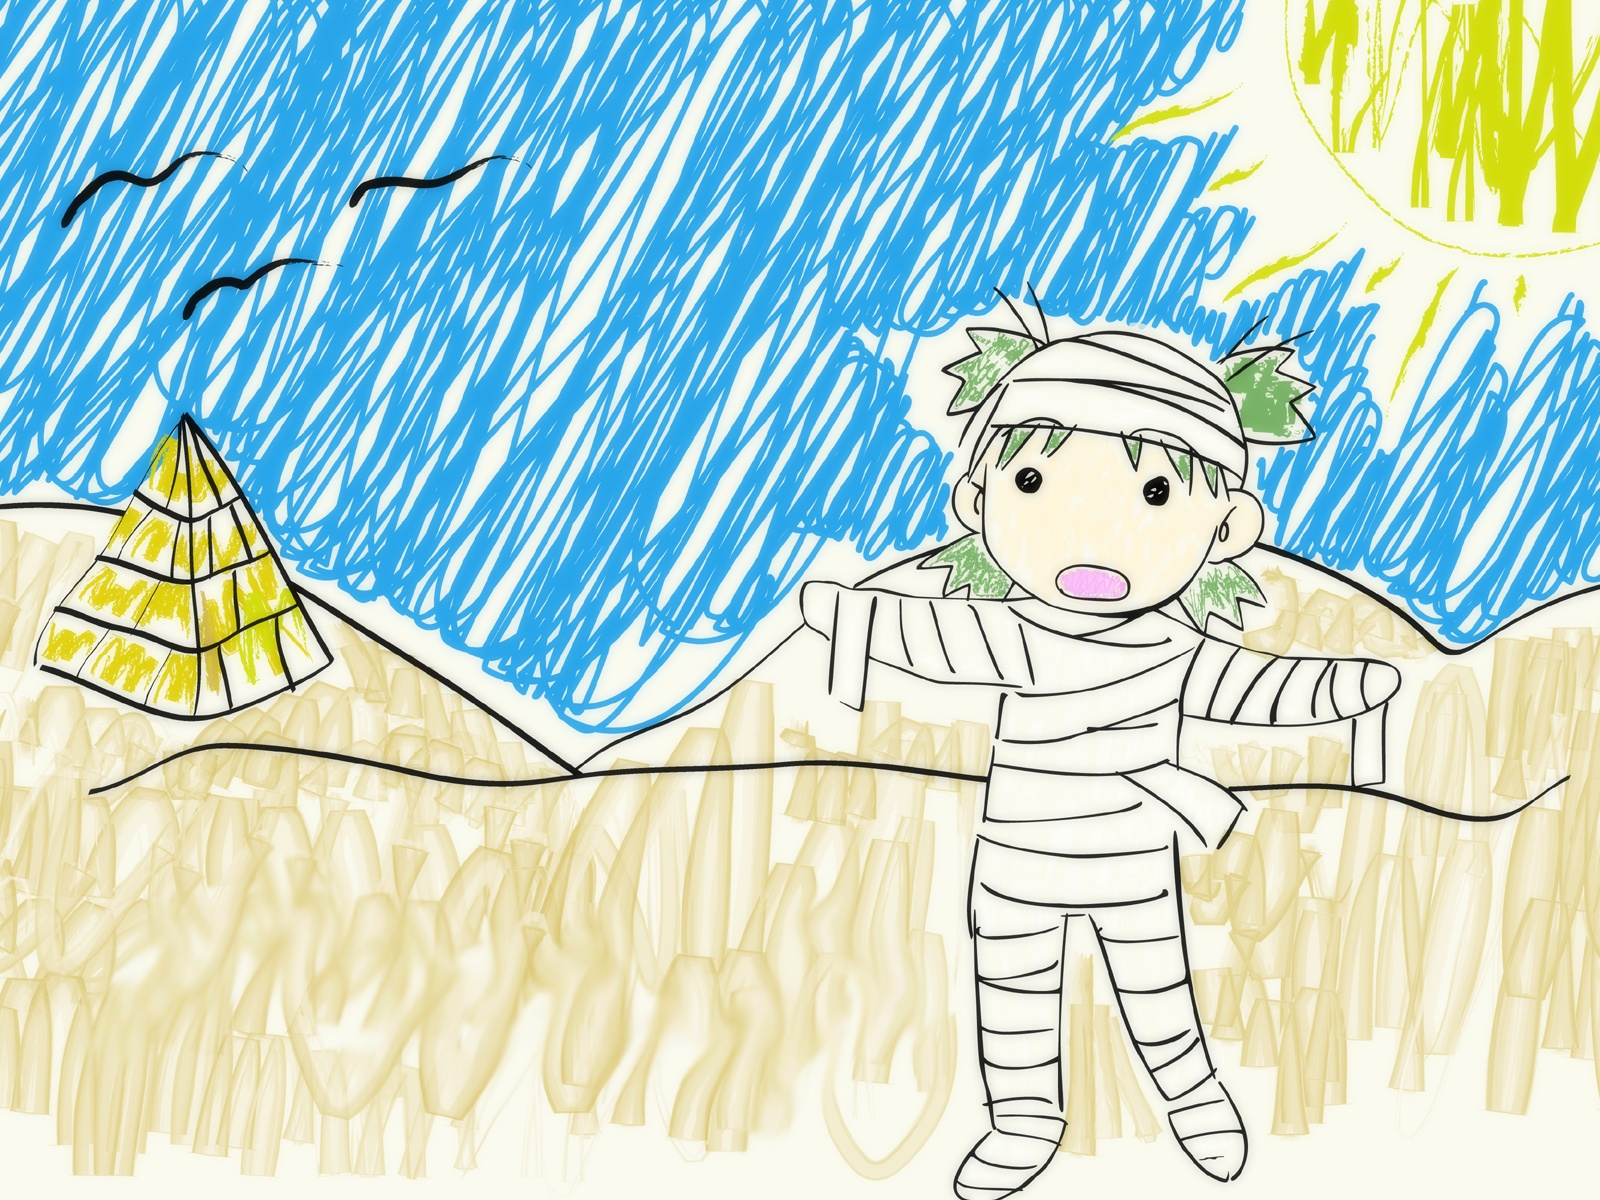 bandage desert koiwai_yotsuba polychromatic sketch yotsubato!